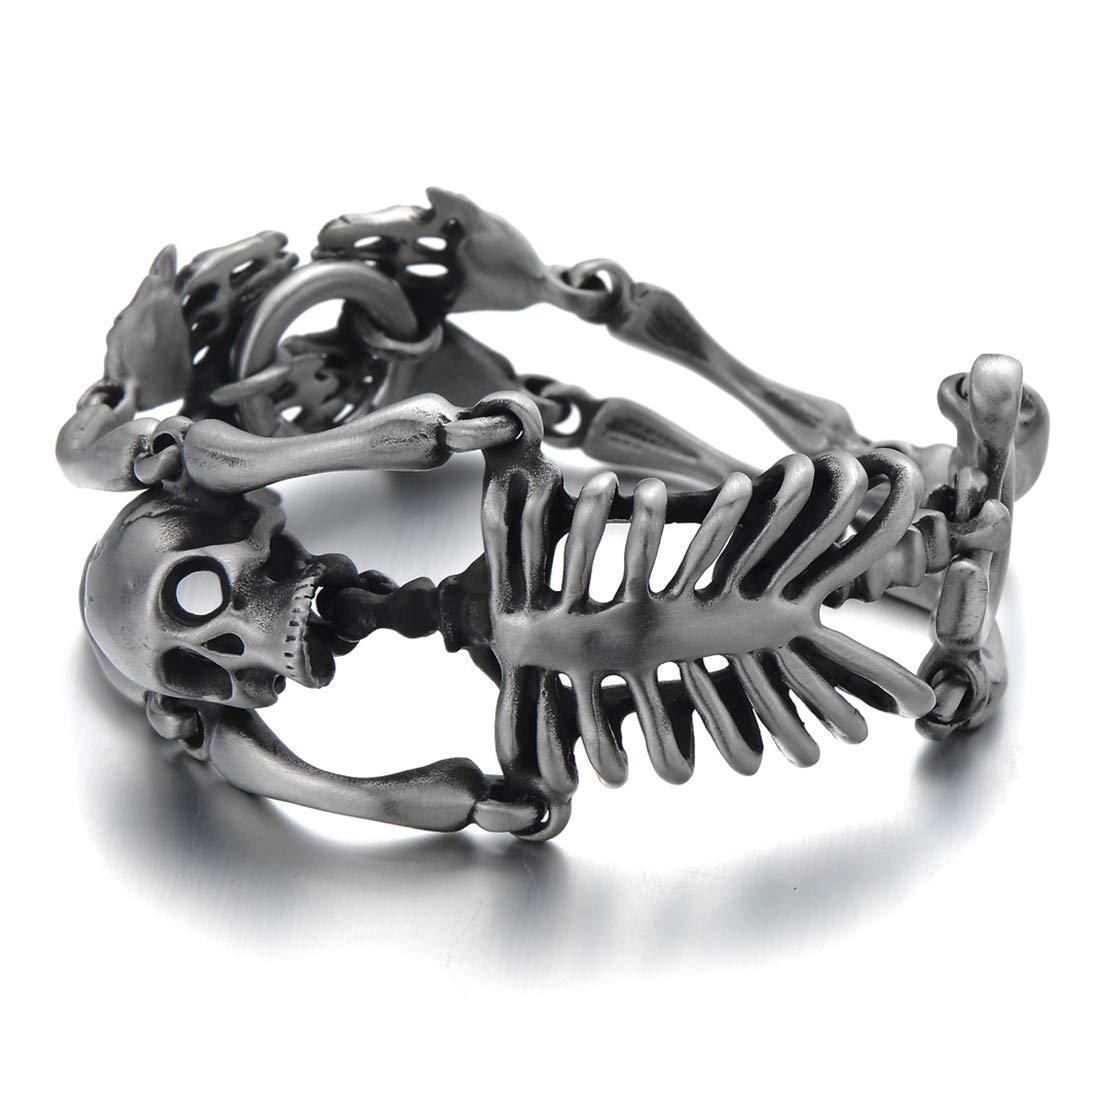 Large Stainless Steel Skull Skeleton Bracelet for Men for Gothic Punk Old Used Metal Treatment